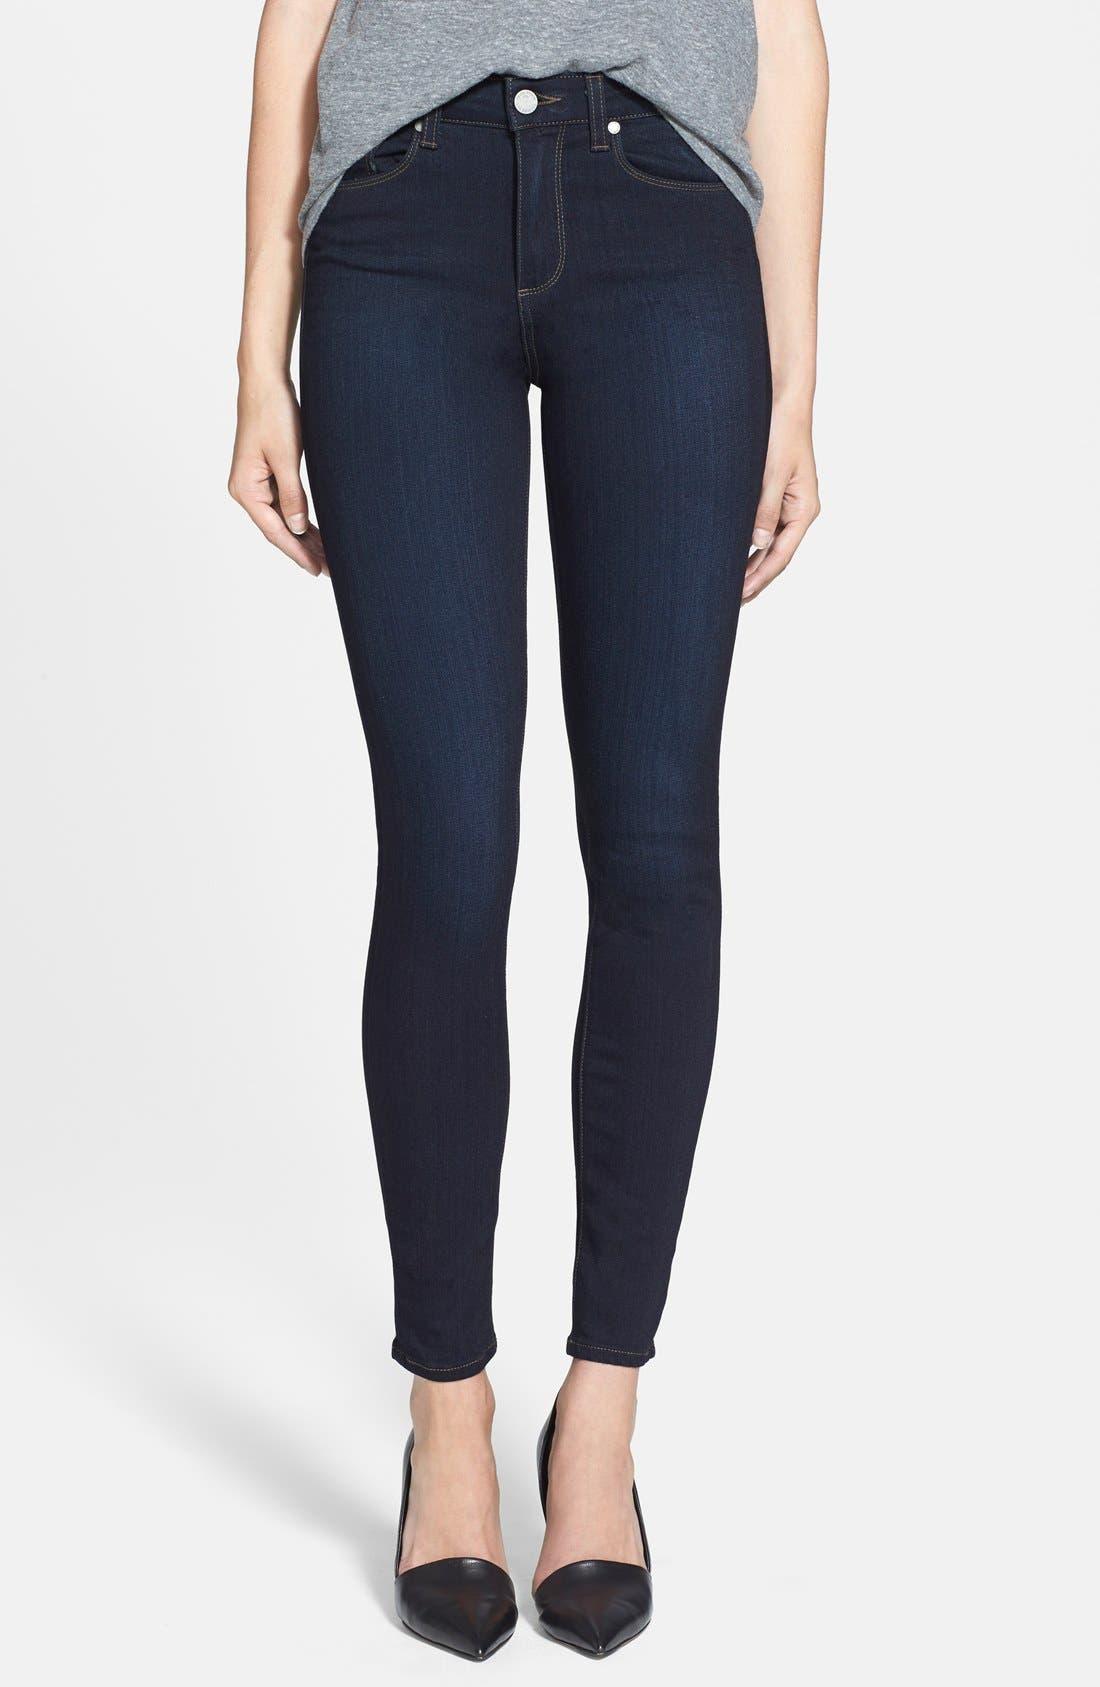 PAIGE Transcend - Hoxton High Waist Ultra Skinny Jeans, Main, color, MONA